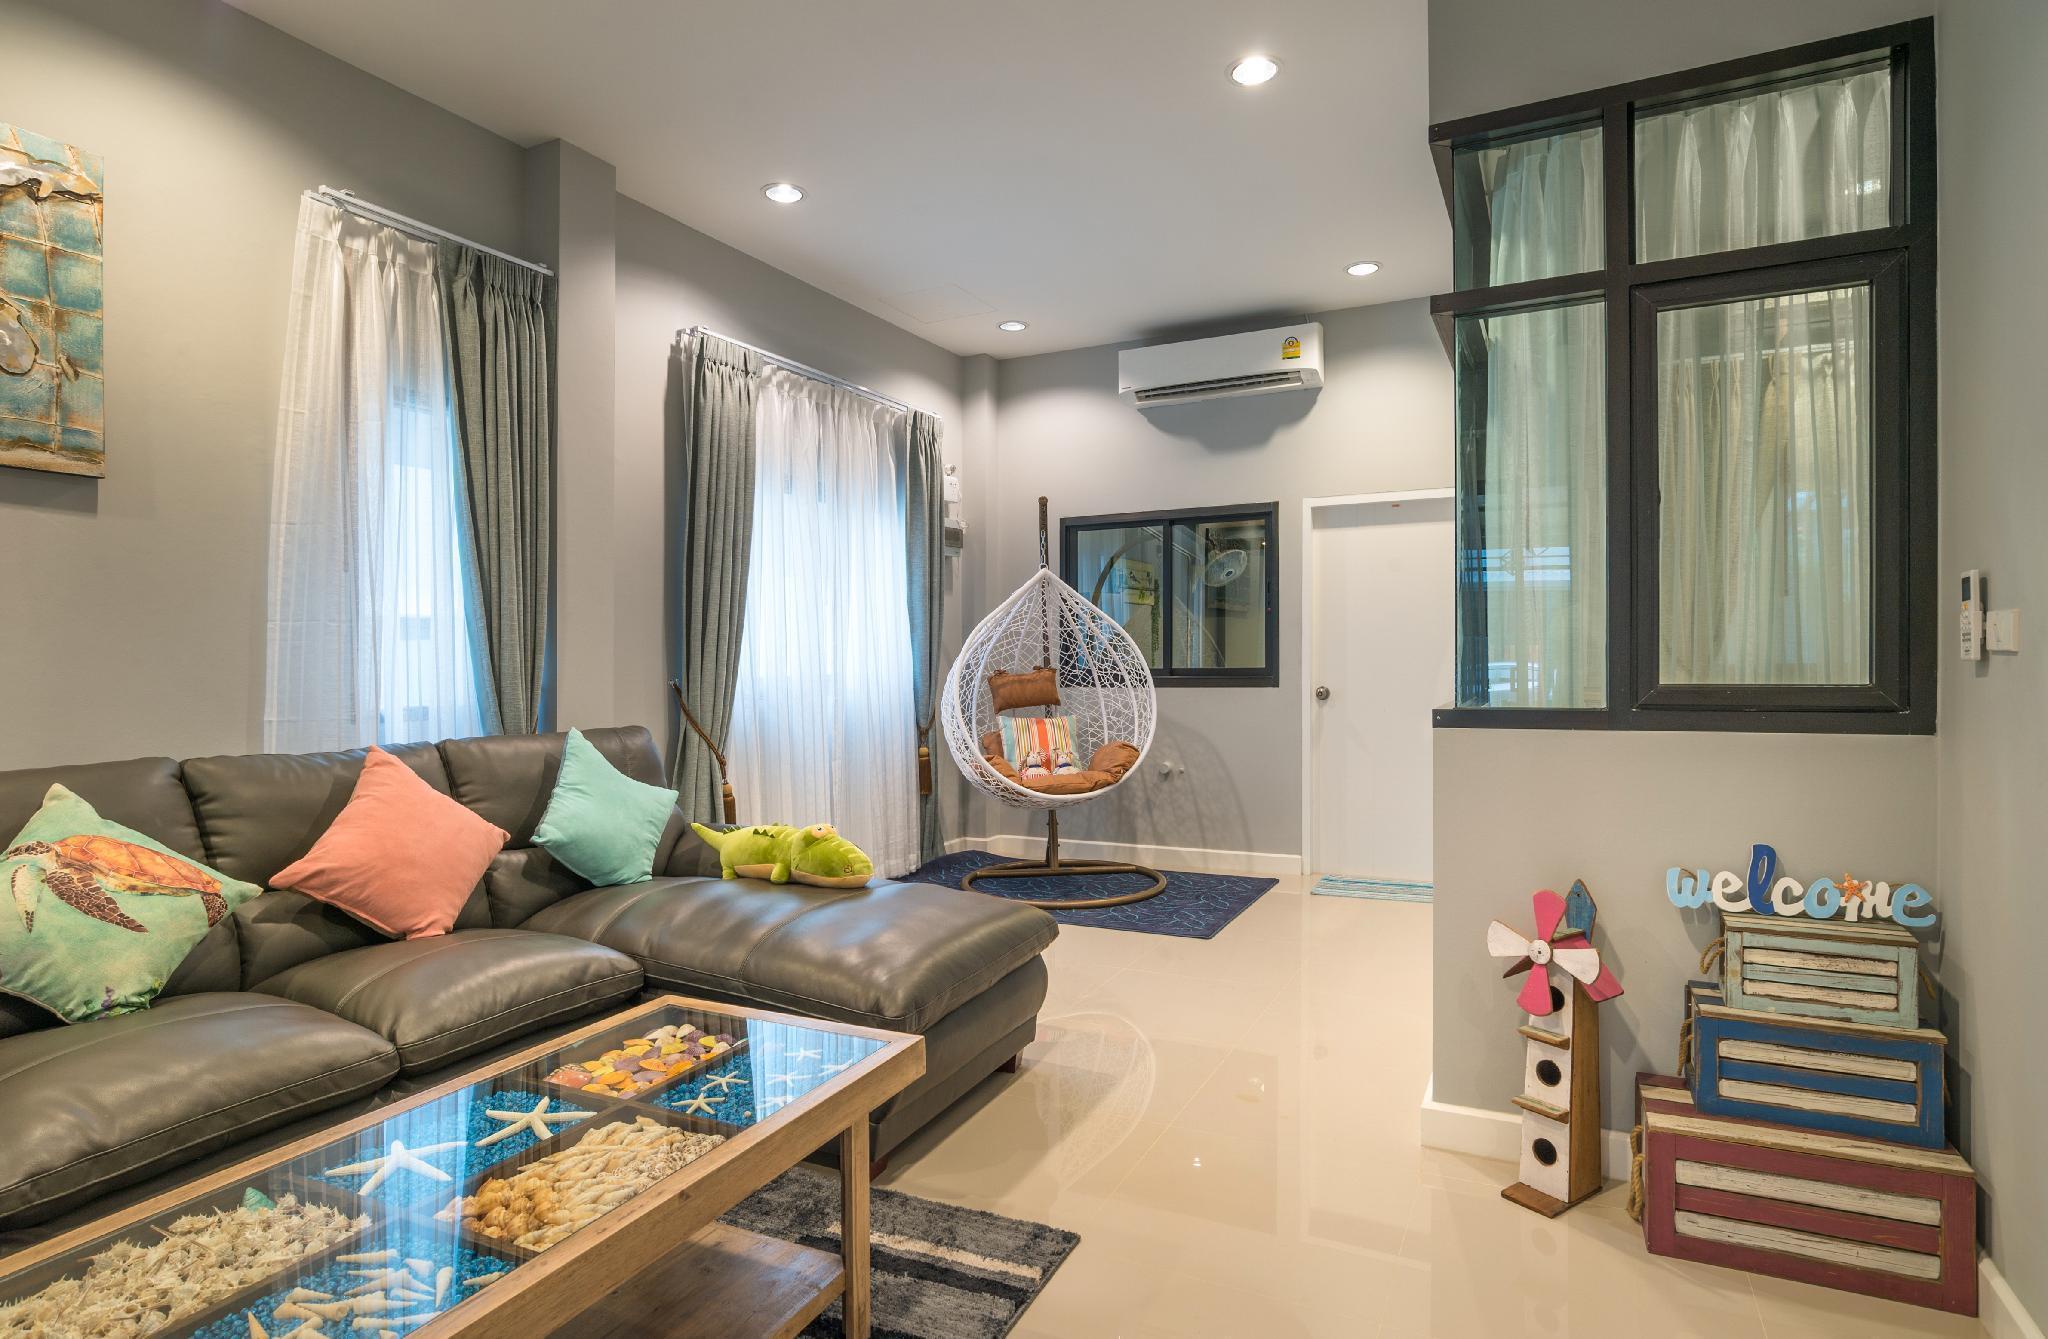 Krabi sweety home บ้านเดี่ยว 4 ห้องนอน 3 ห้องน้ำส่วนตัว ขนาด 120 ตร.ม. – ตัวเมืองกระบี่